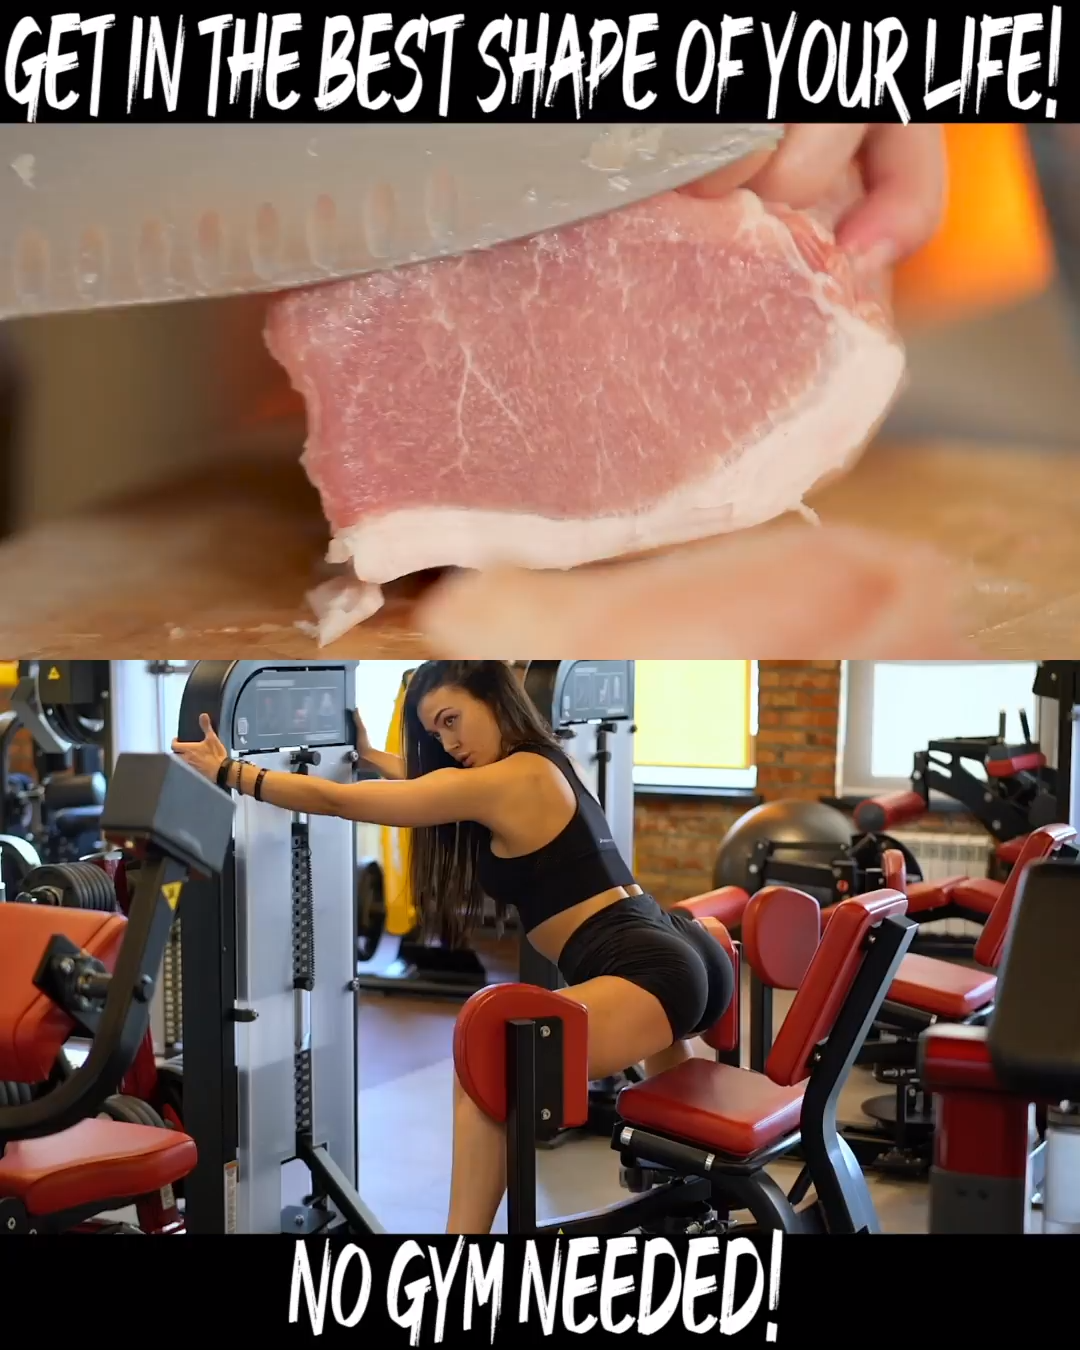 V Shred Fitness Plan,  #diygiftsforfriendsvideoschristian #fitness #Plan #Shred